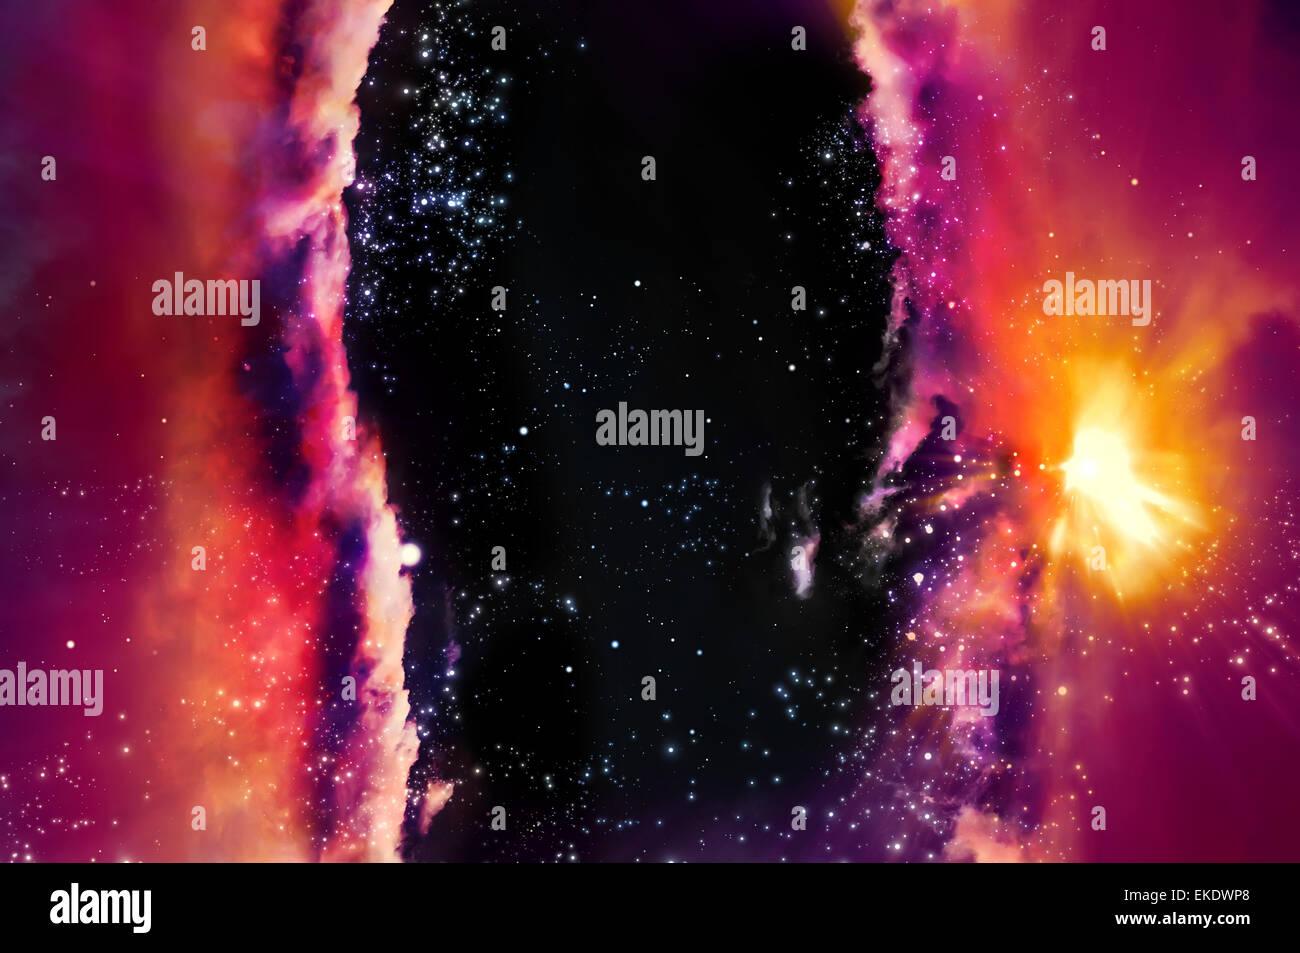 skirmish of galaxies - Stock Image